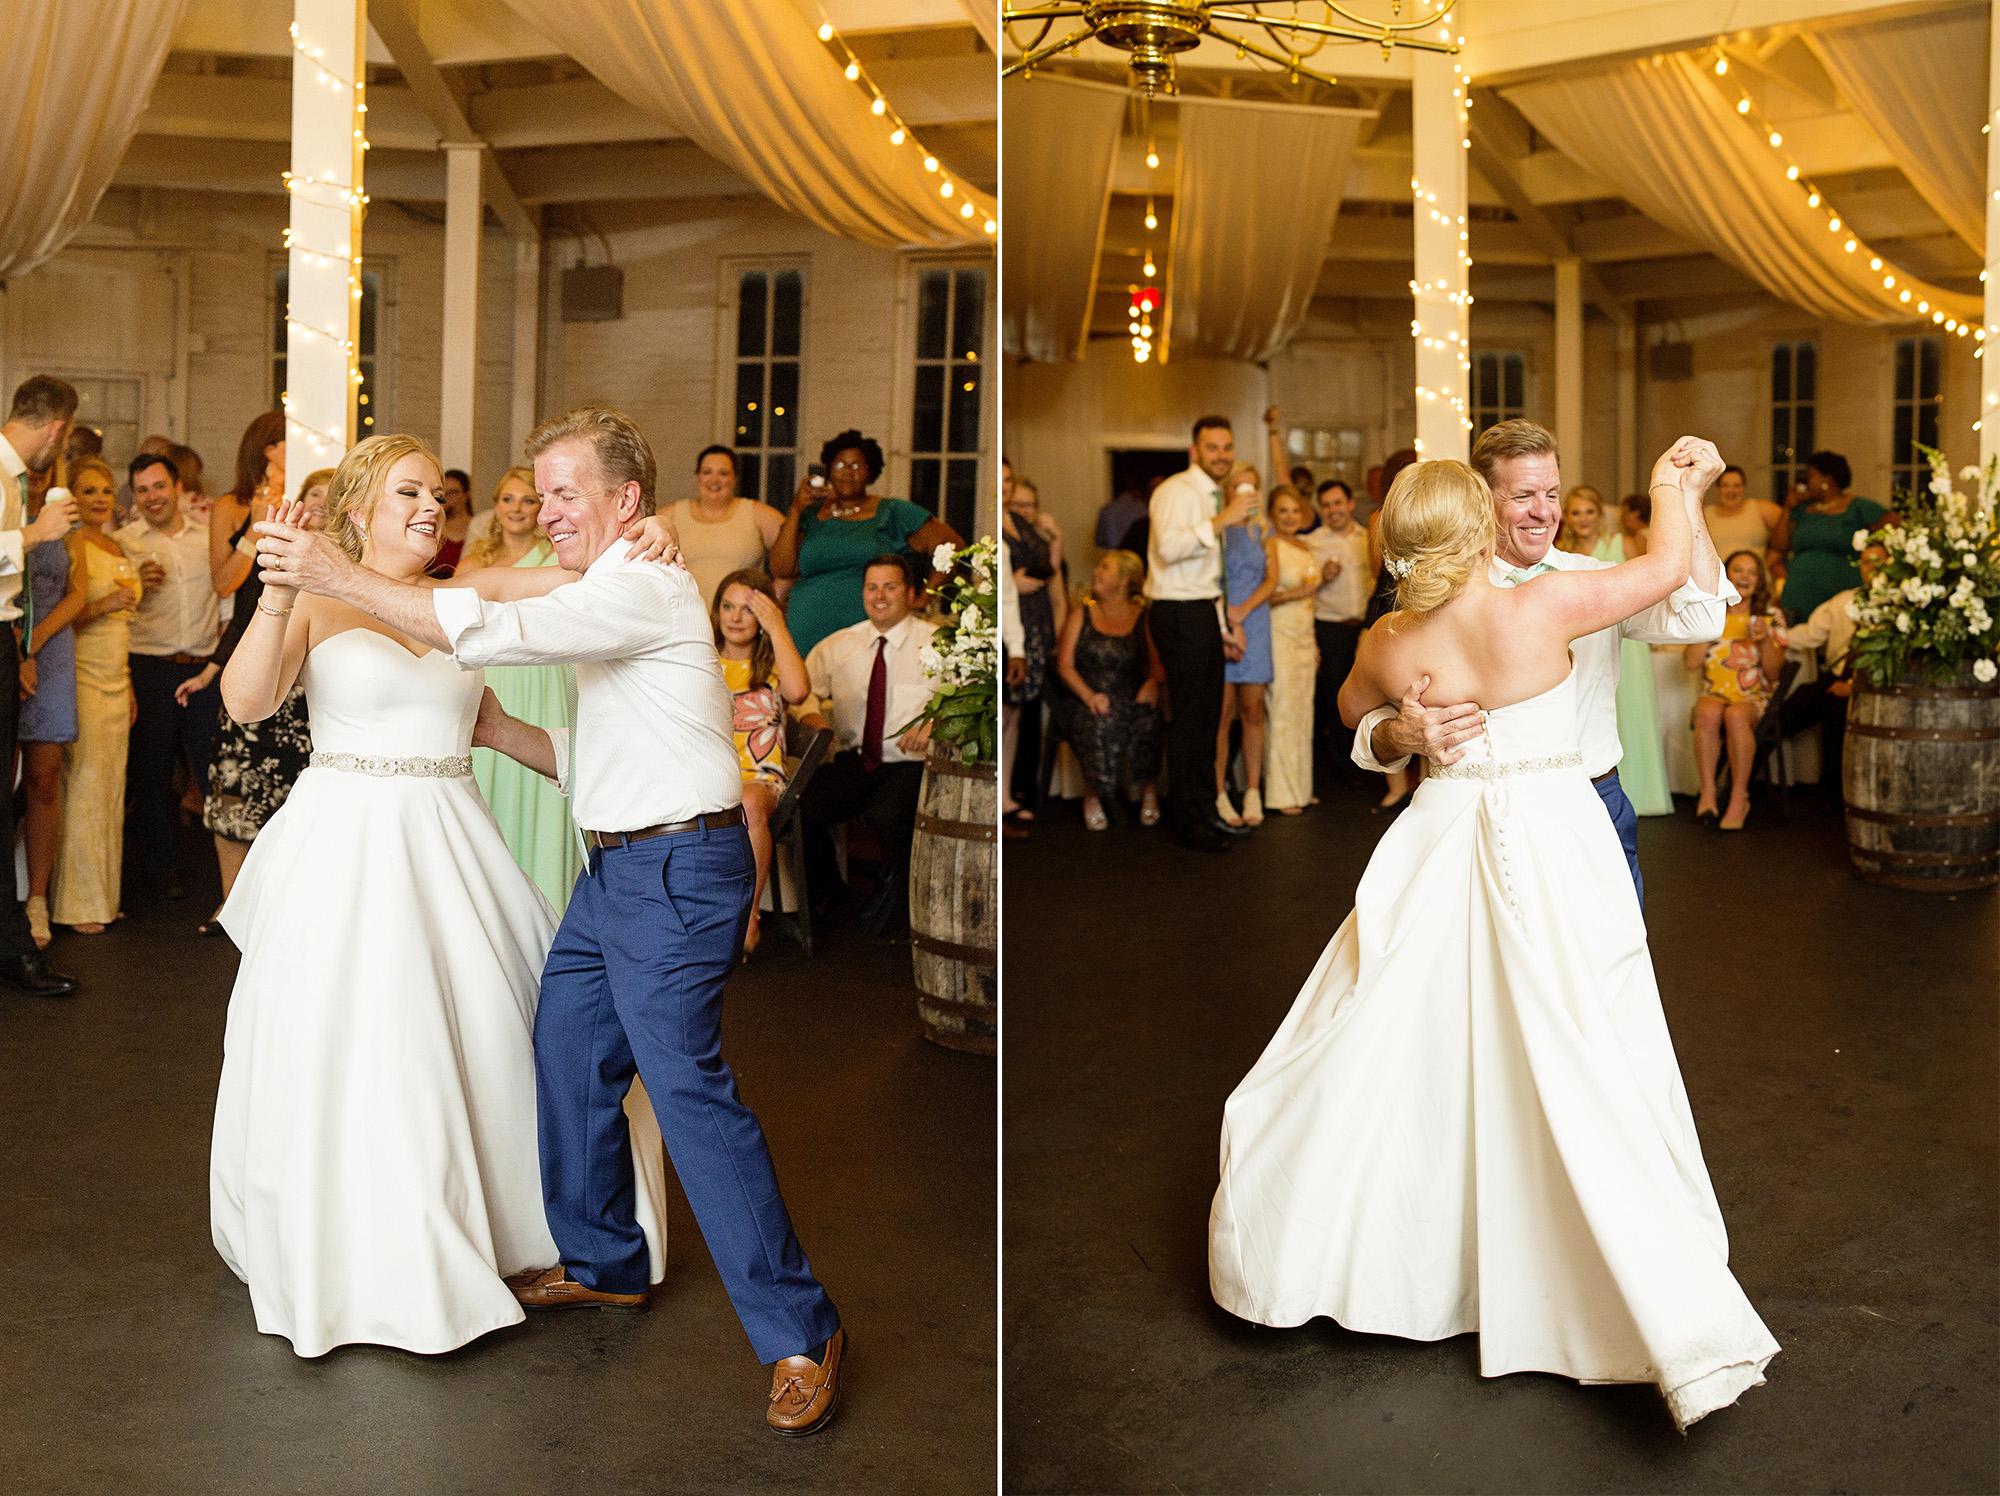 Seriously_Sabrina_Photography_Lexington_Kentucky_Pax_Christi_Round_Barn_Wedding_Beath_108.jpg